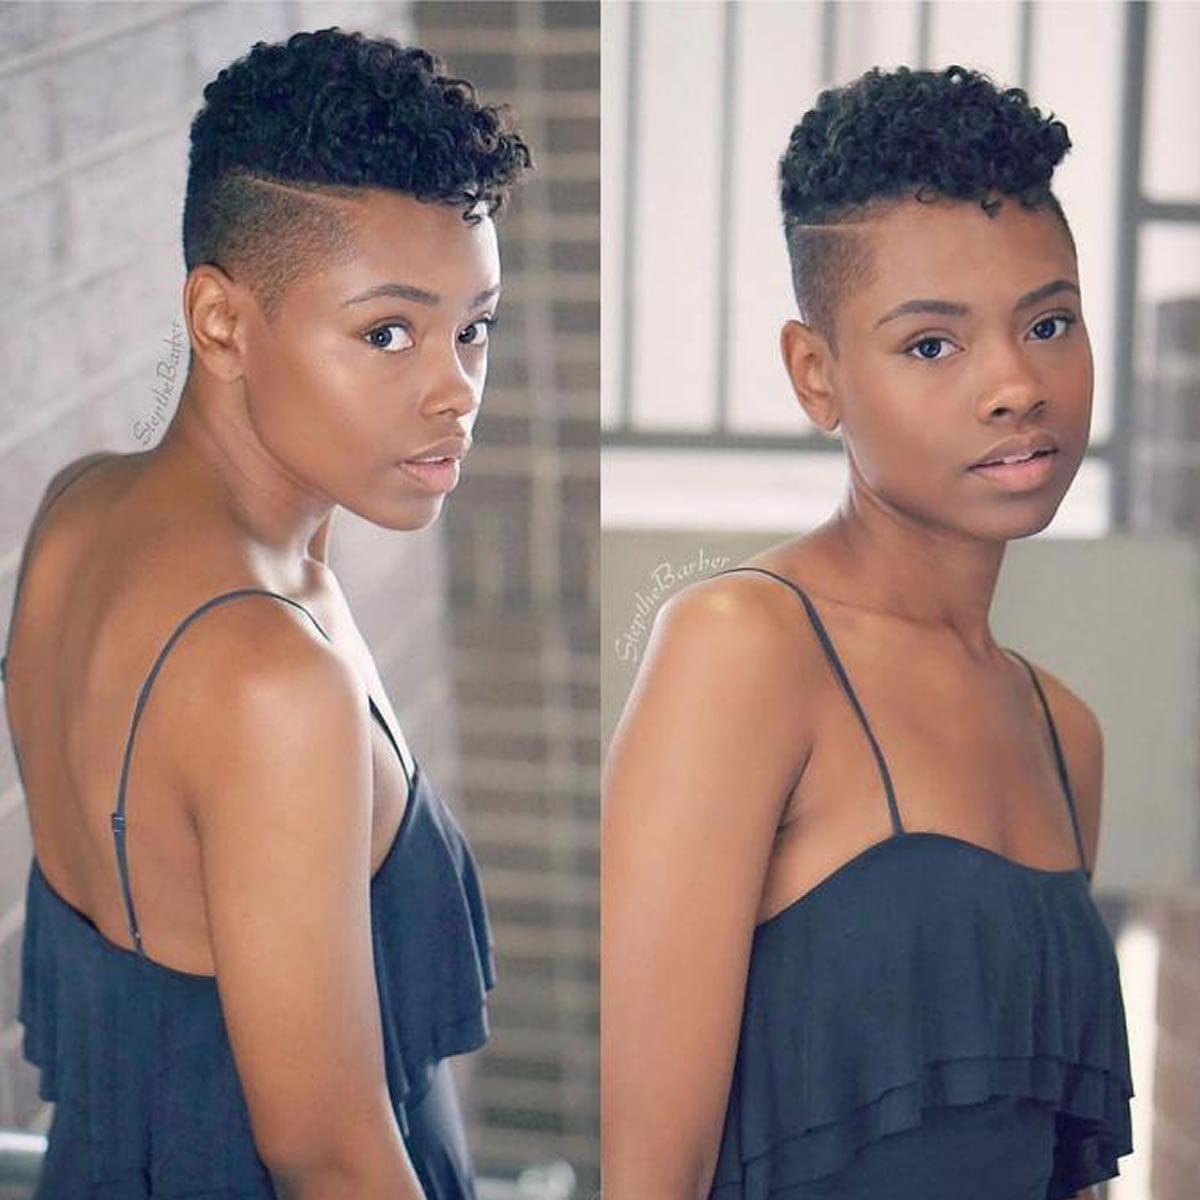 Short Medium And Long Hair Ideas Amp Hairstyles For Black